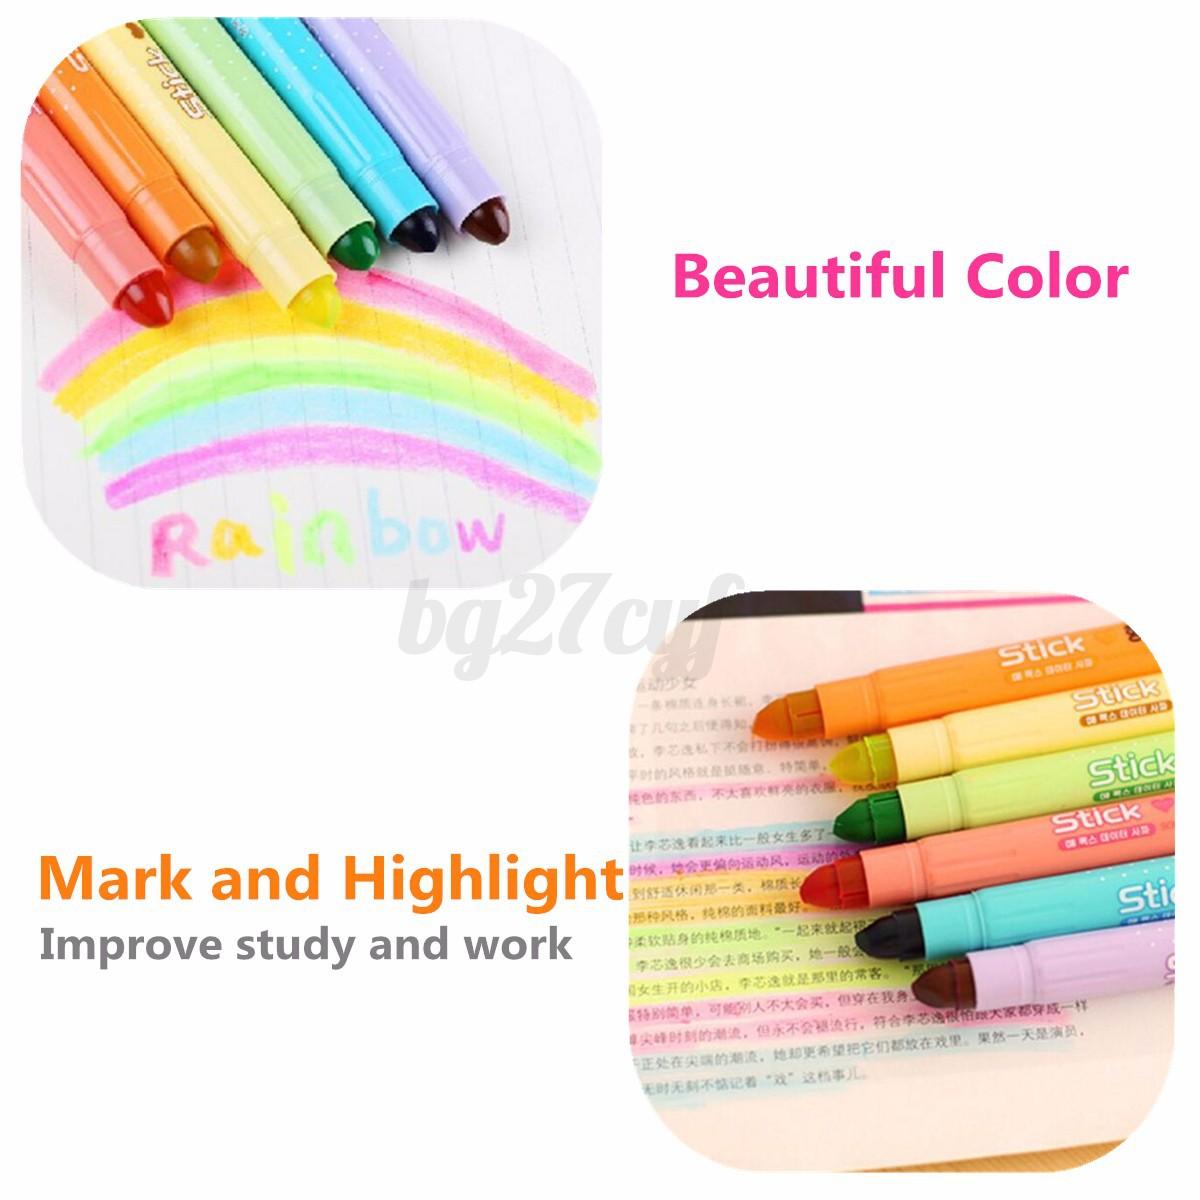 6 Colors Set Cute Paint Writer Pens Marker Highlighter